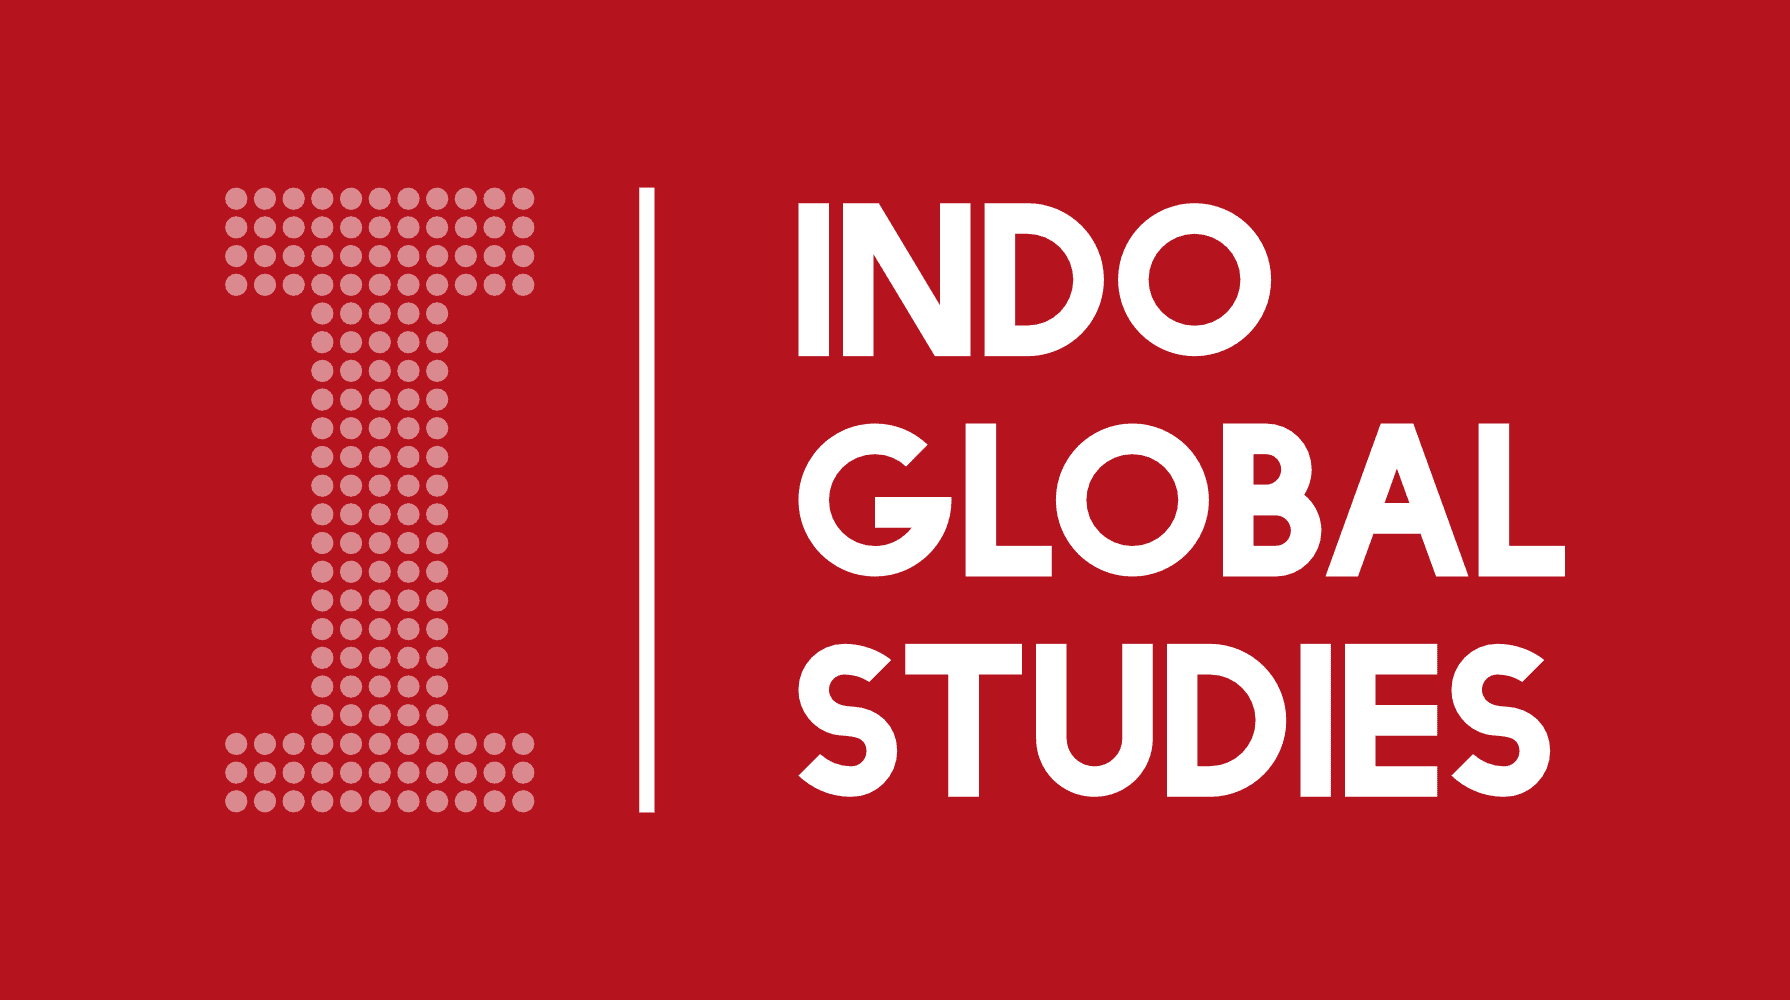 Indo Global Studies